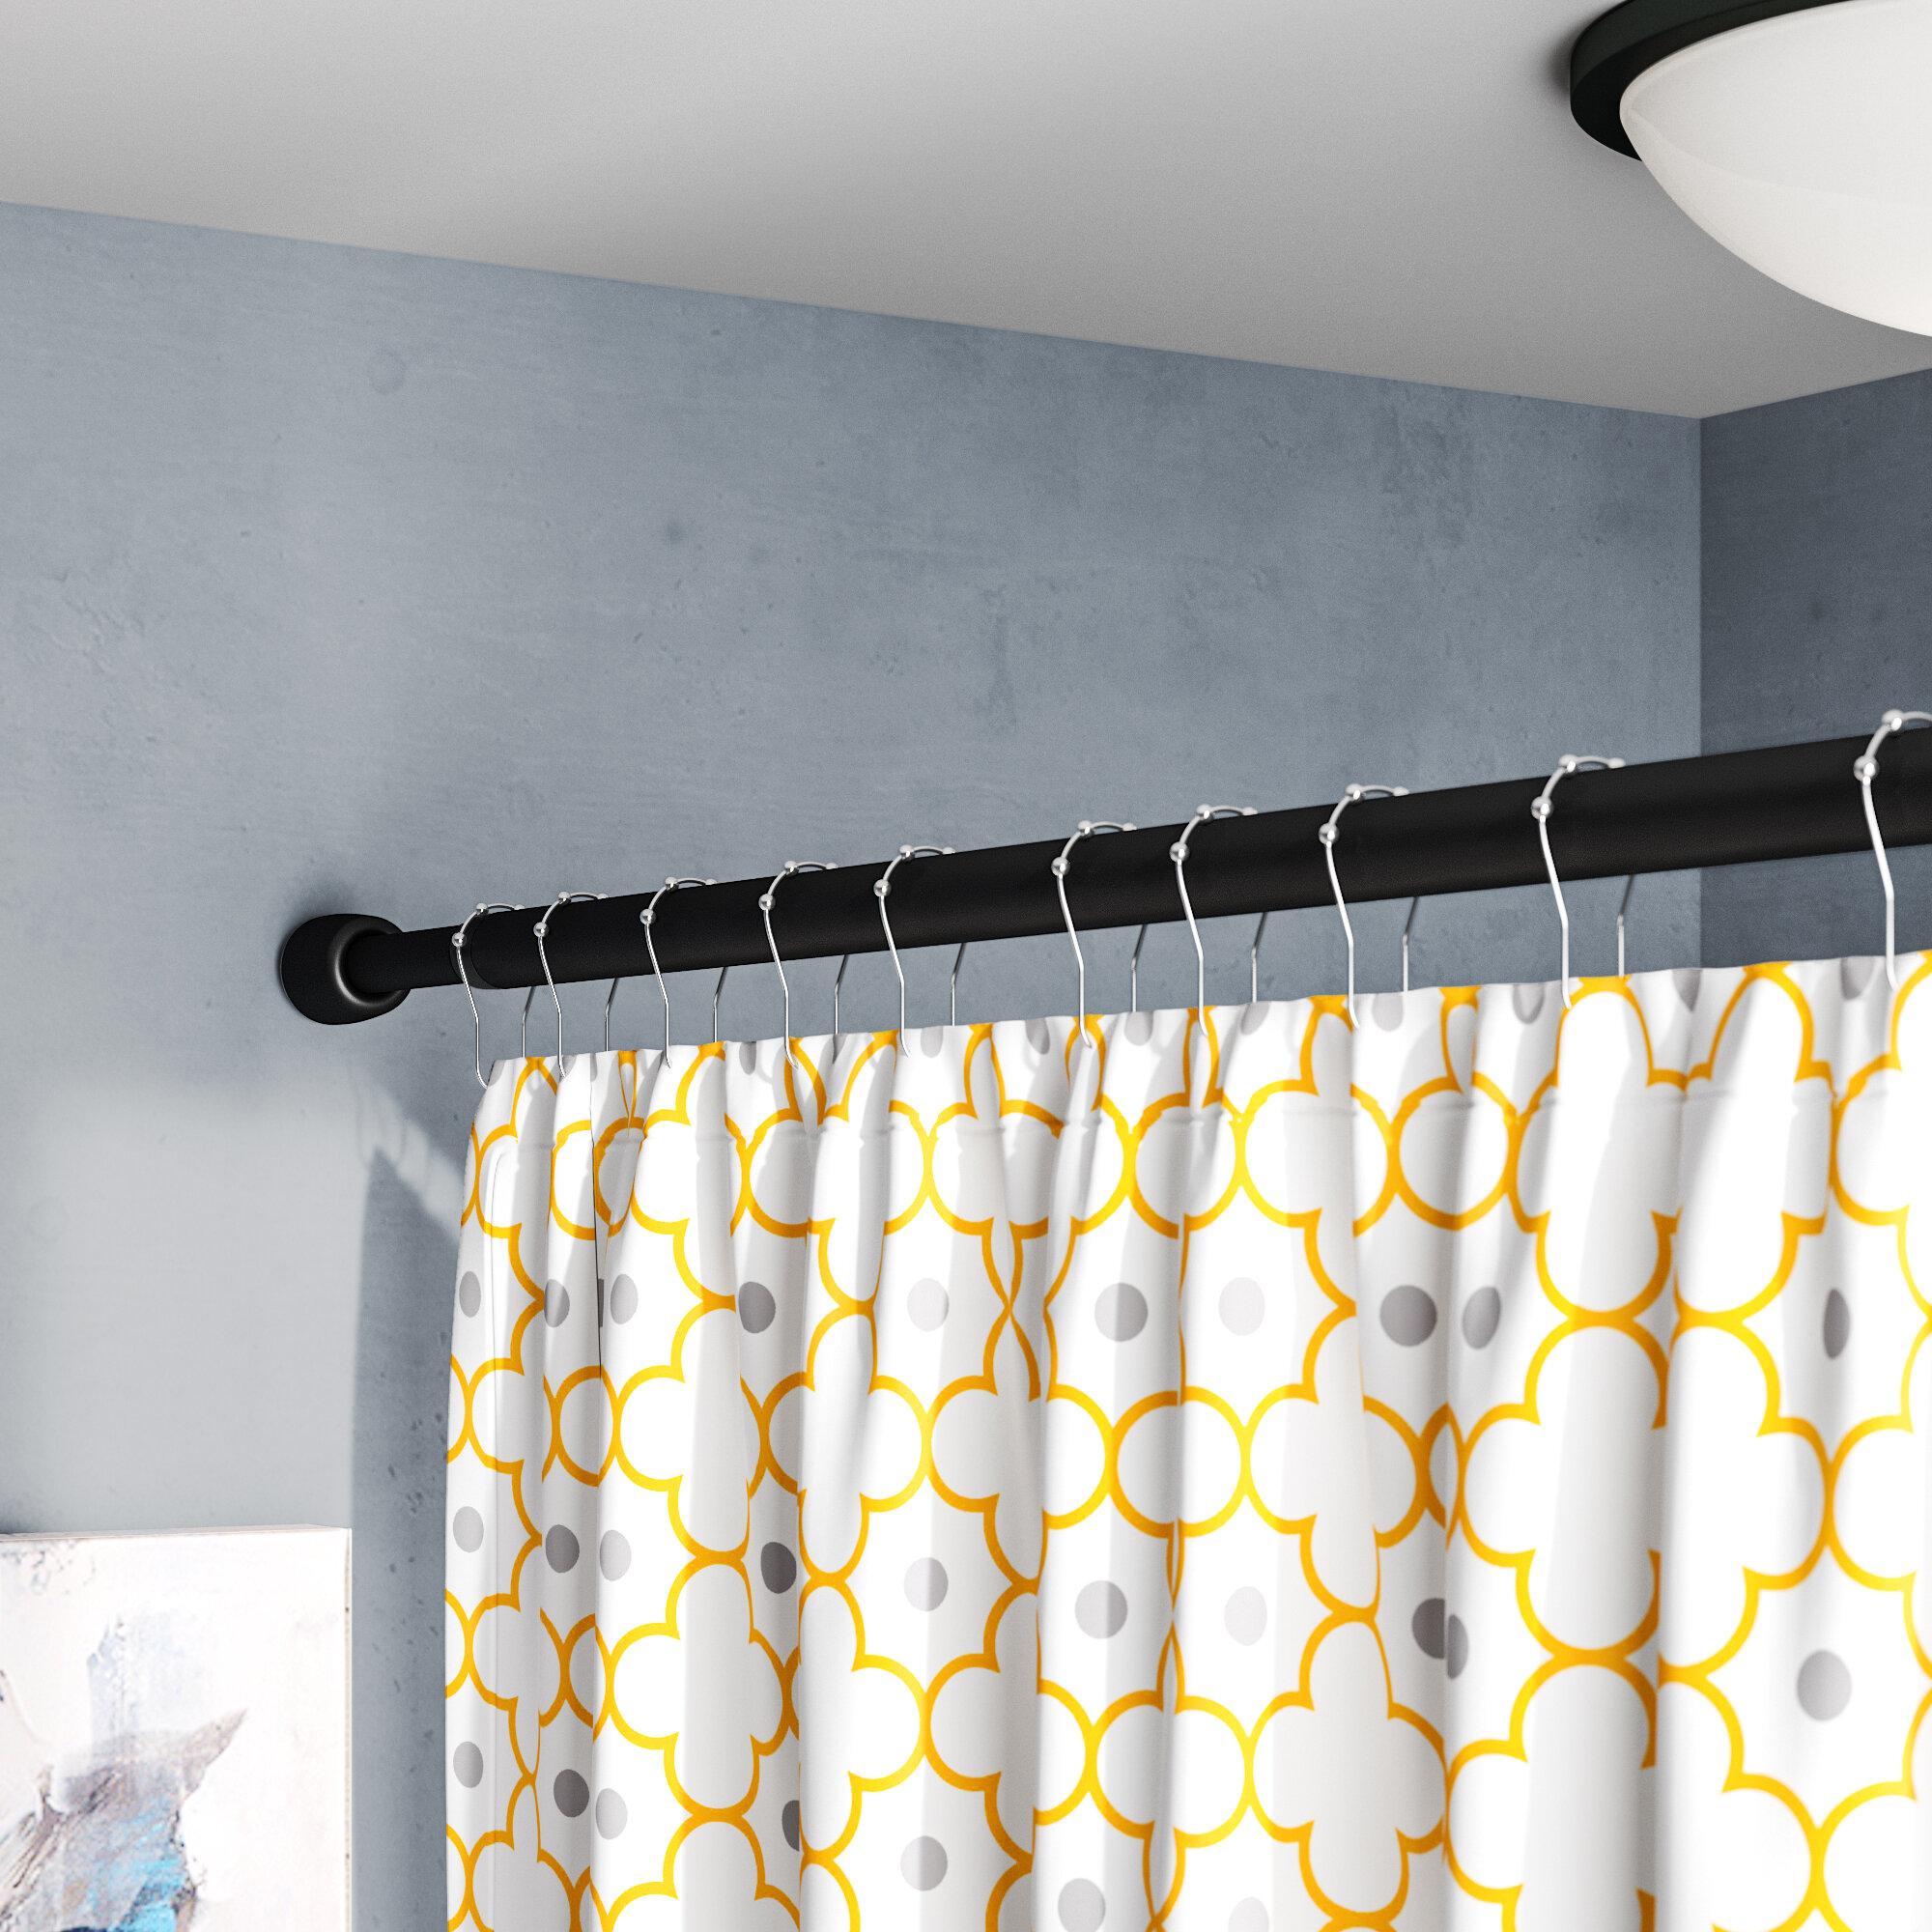 Symple Stuff Larosa 87 Adjustable Straight Tension Shower Curtain